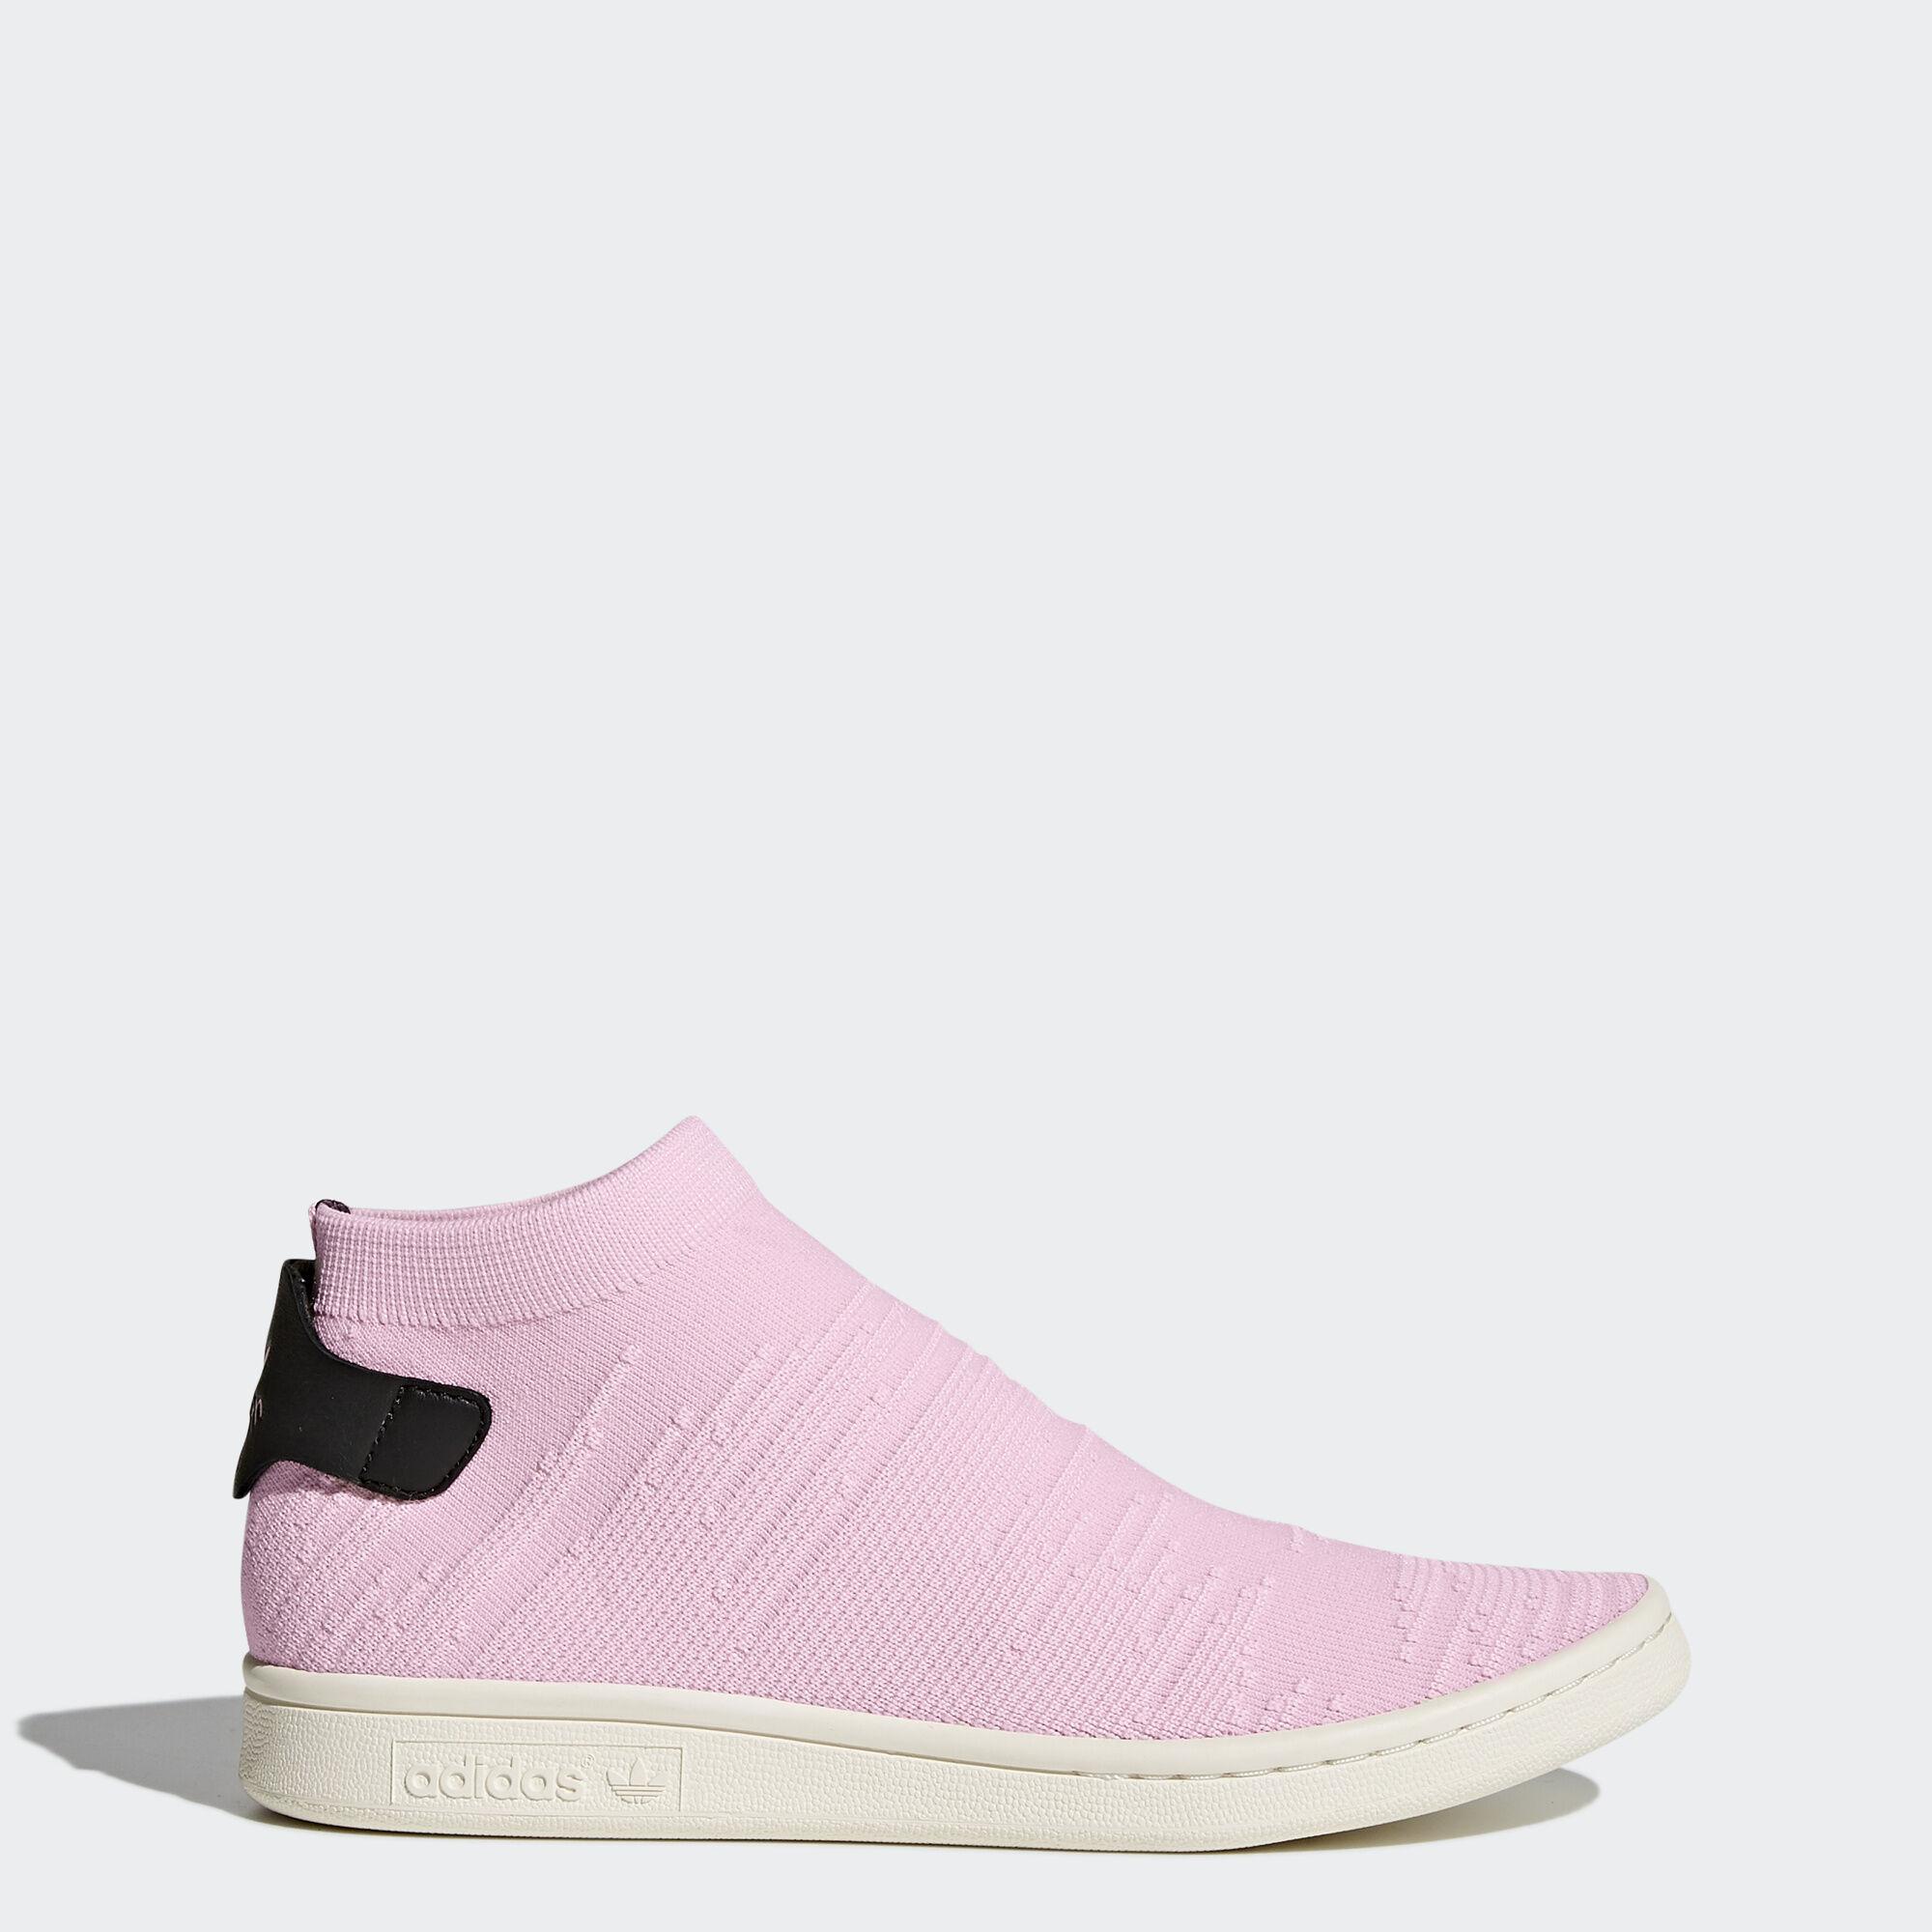 adidas stans smith rosa